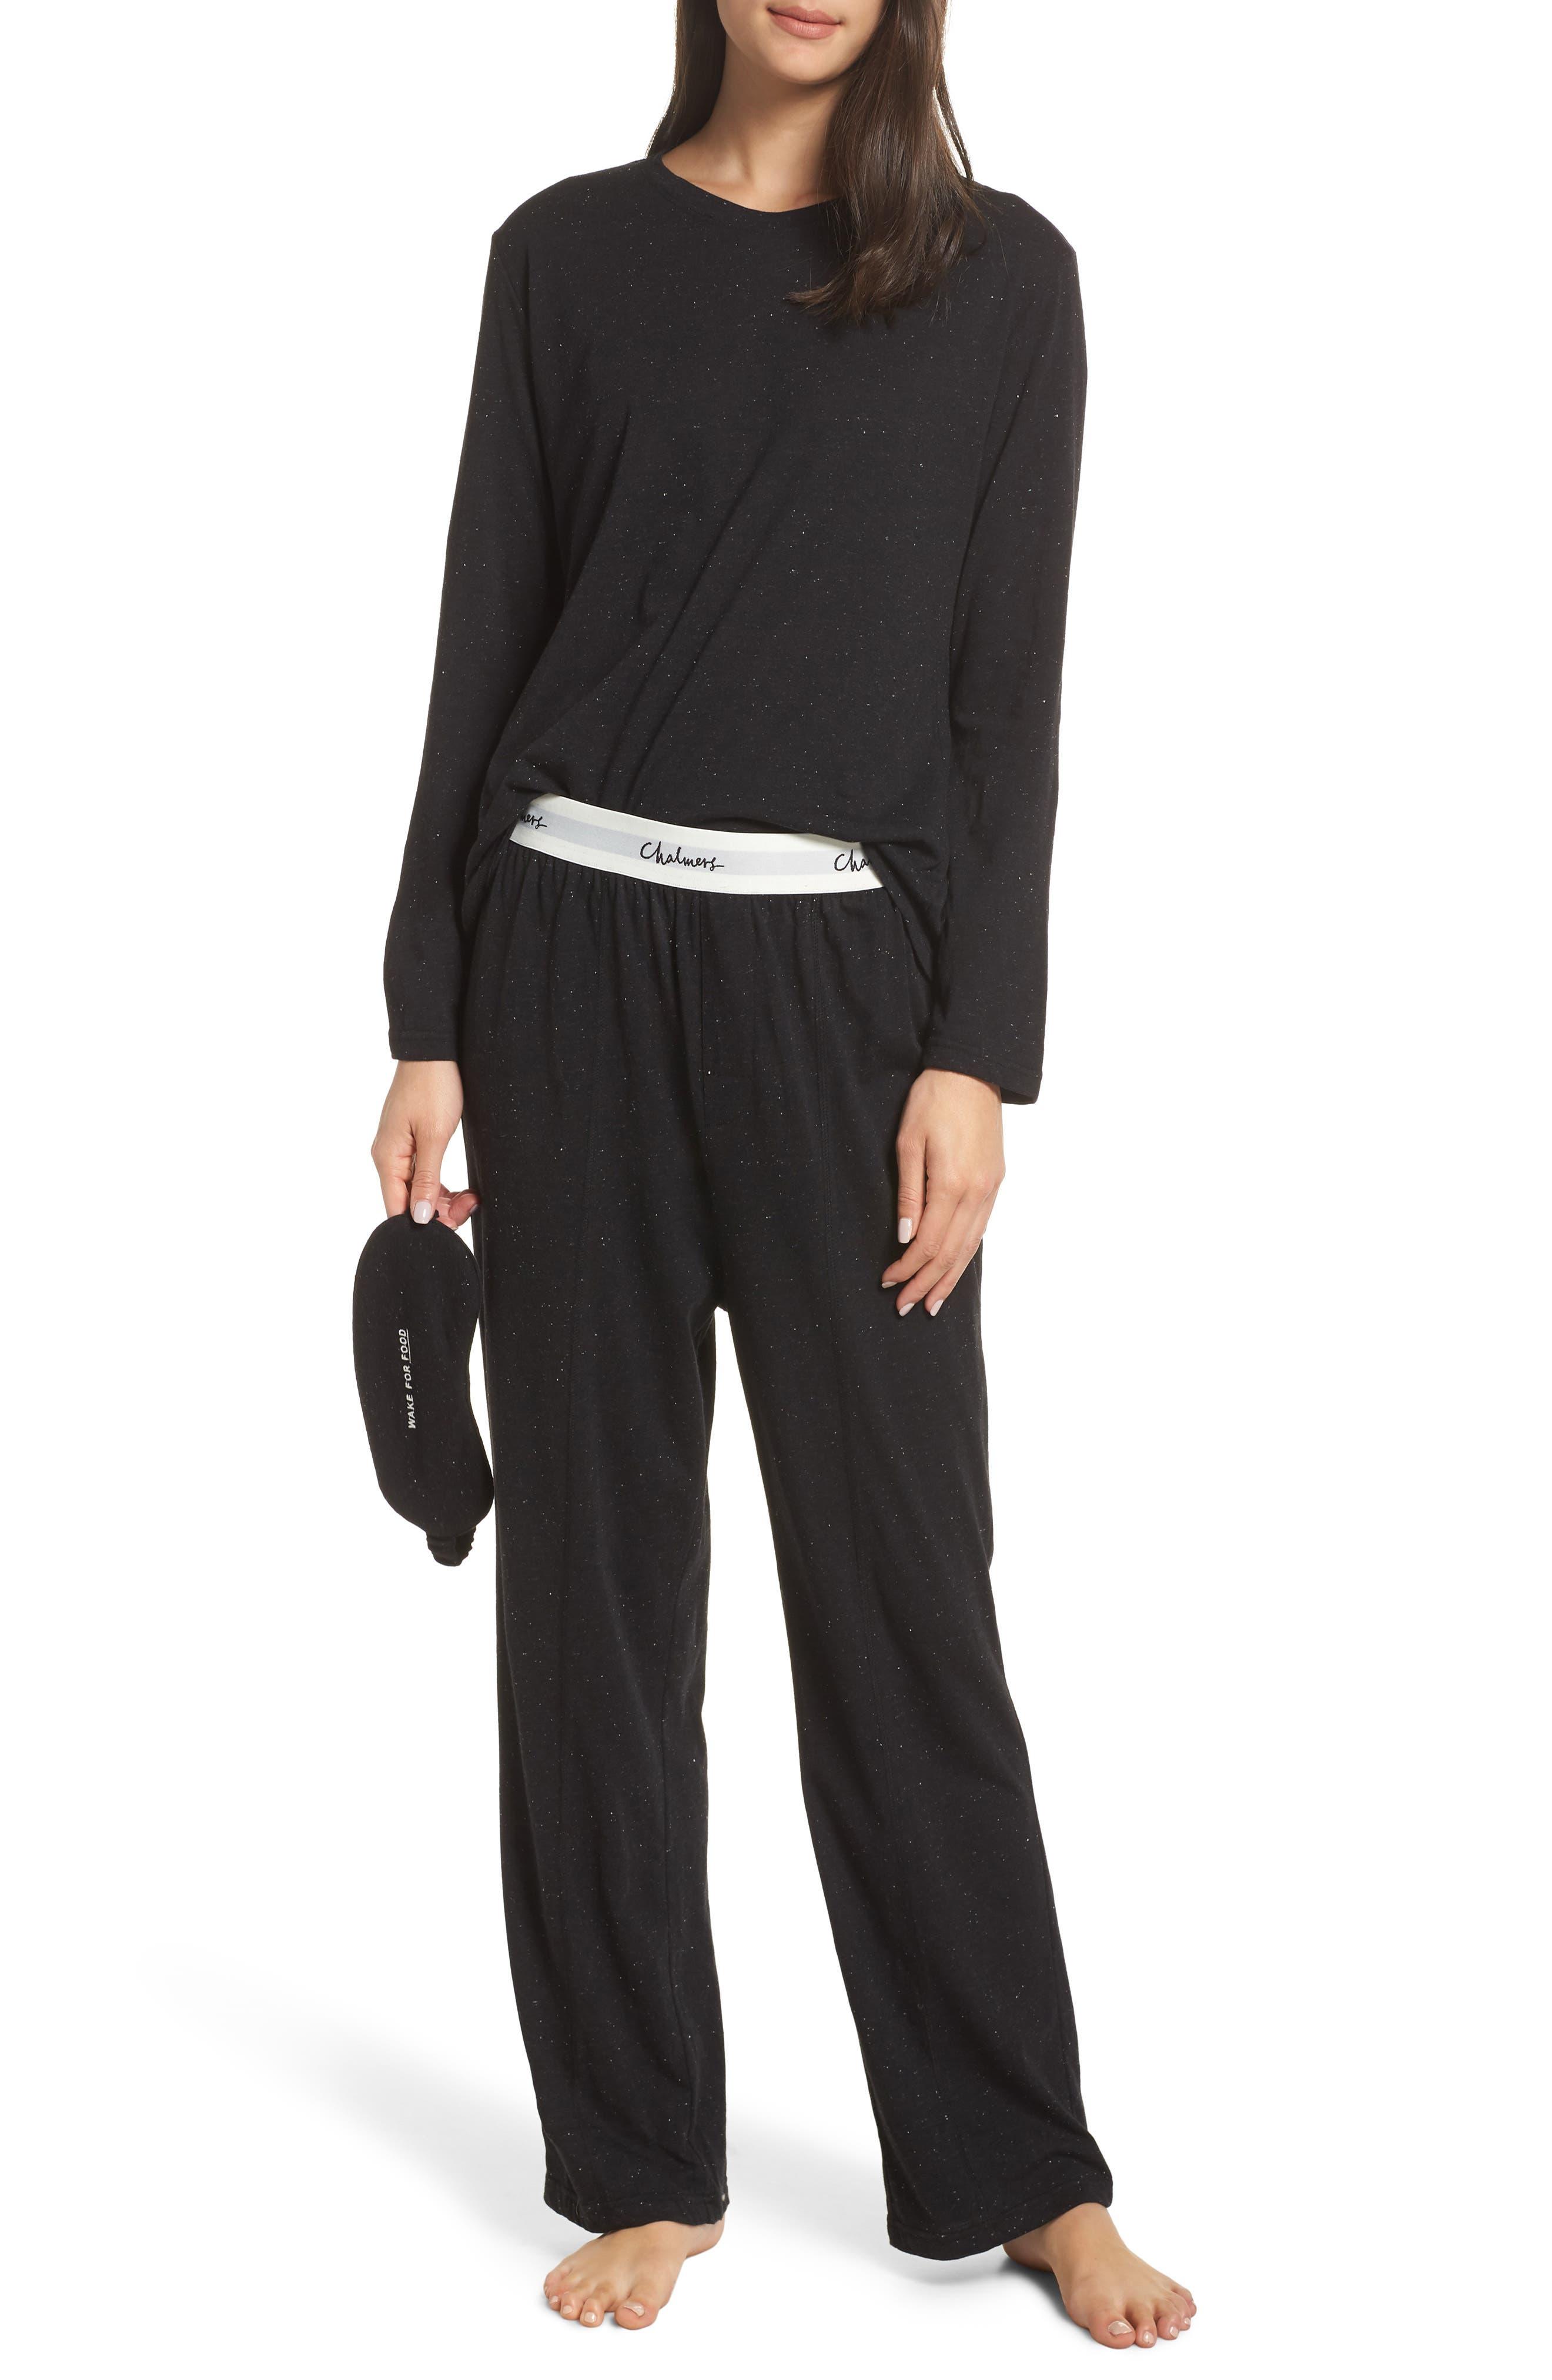 Chalmers Milly Pajamas & Sleep Mask Set, Grey